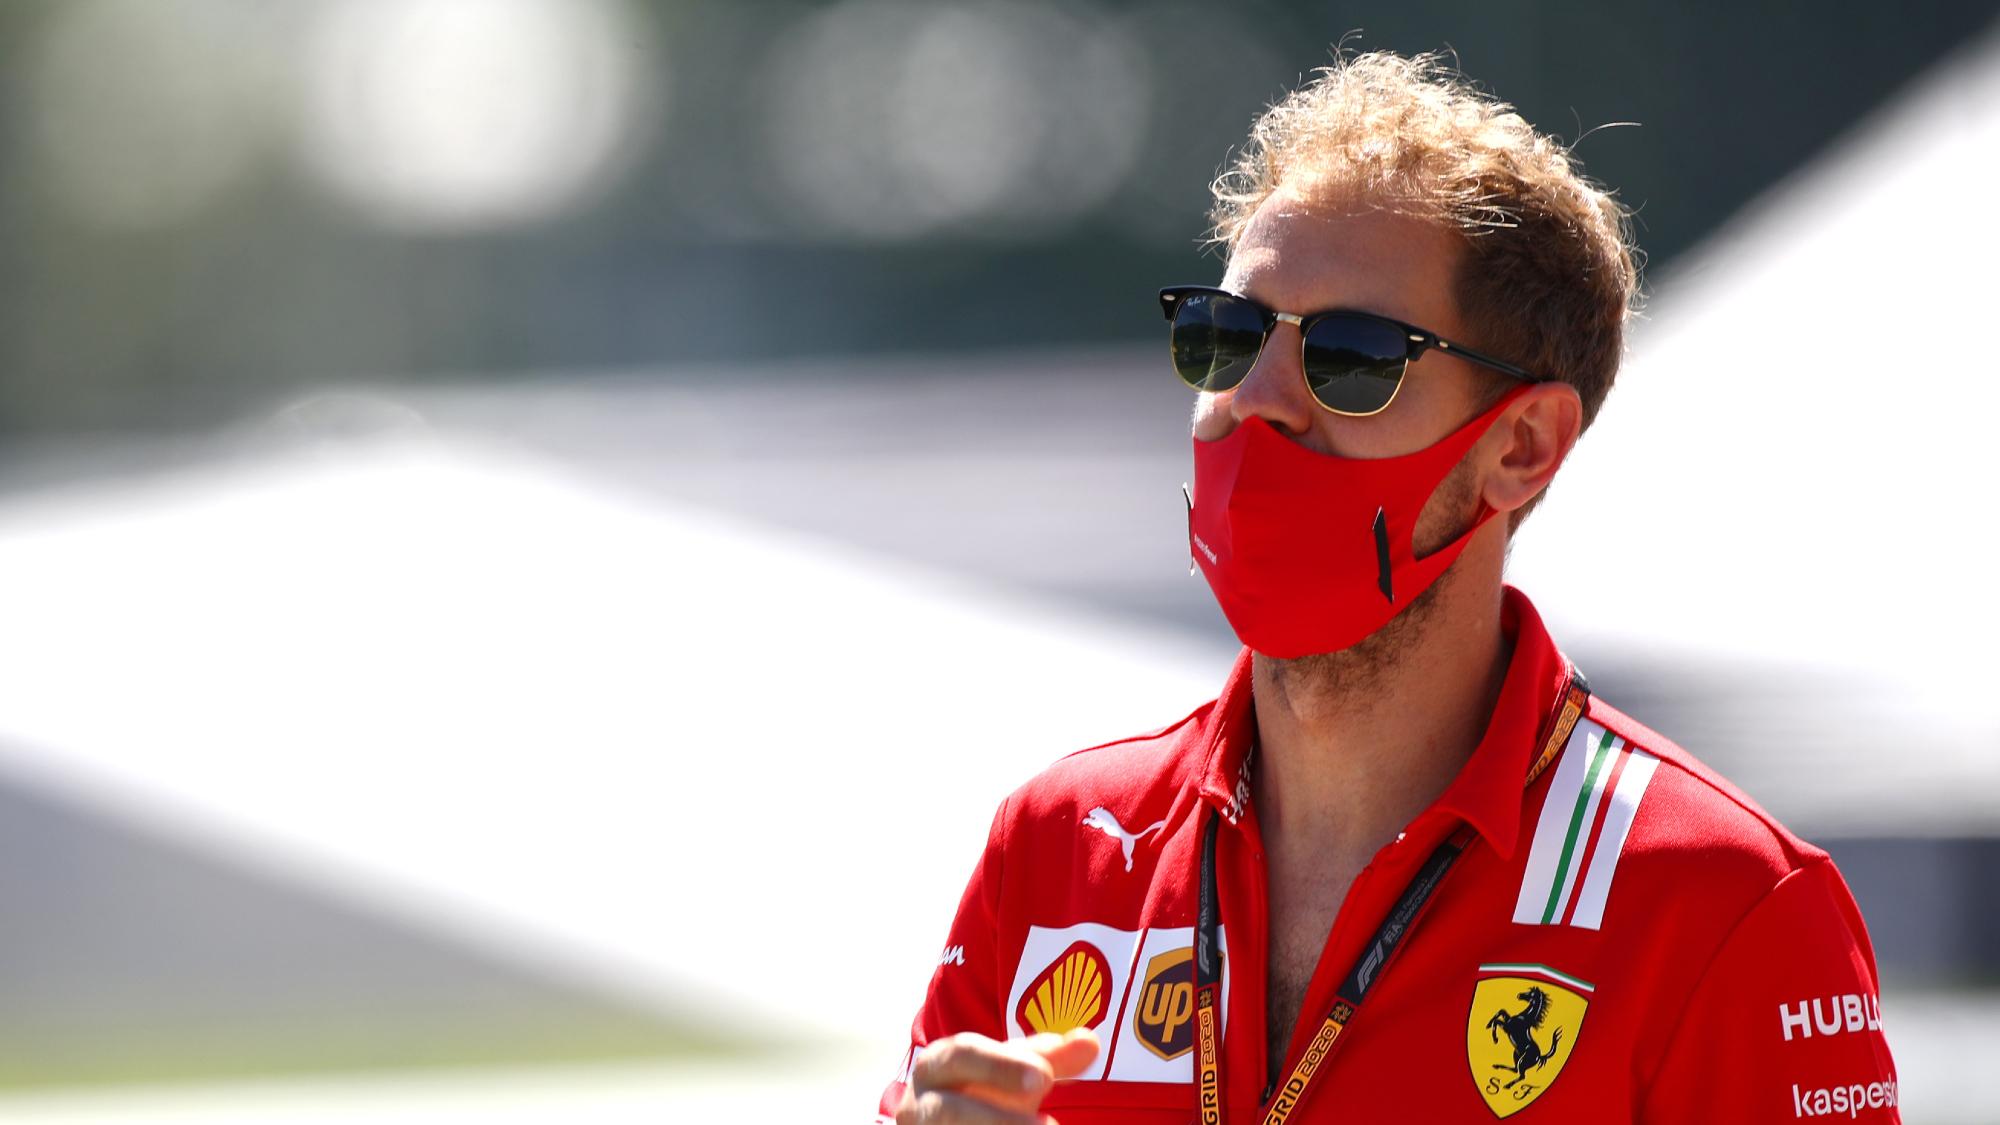 Sebastian Vettel, Austrian GP 2020